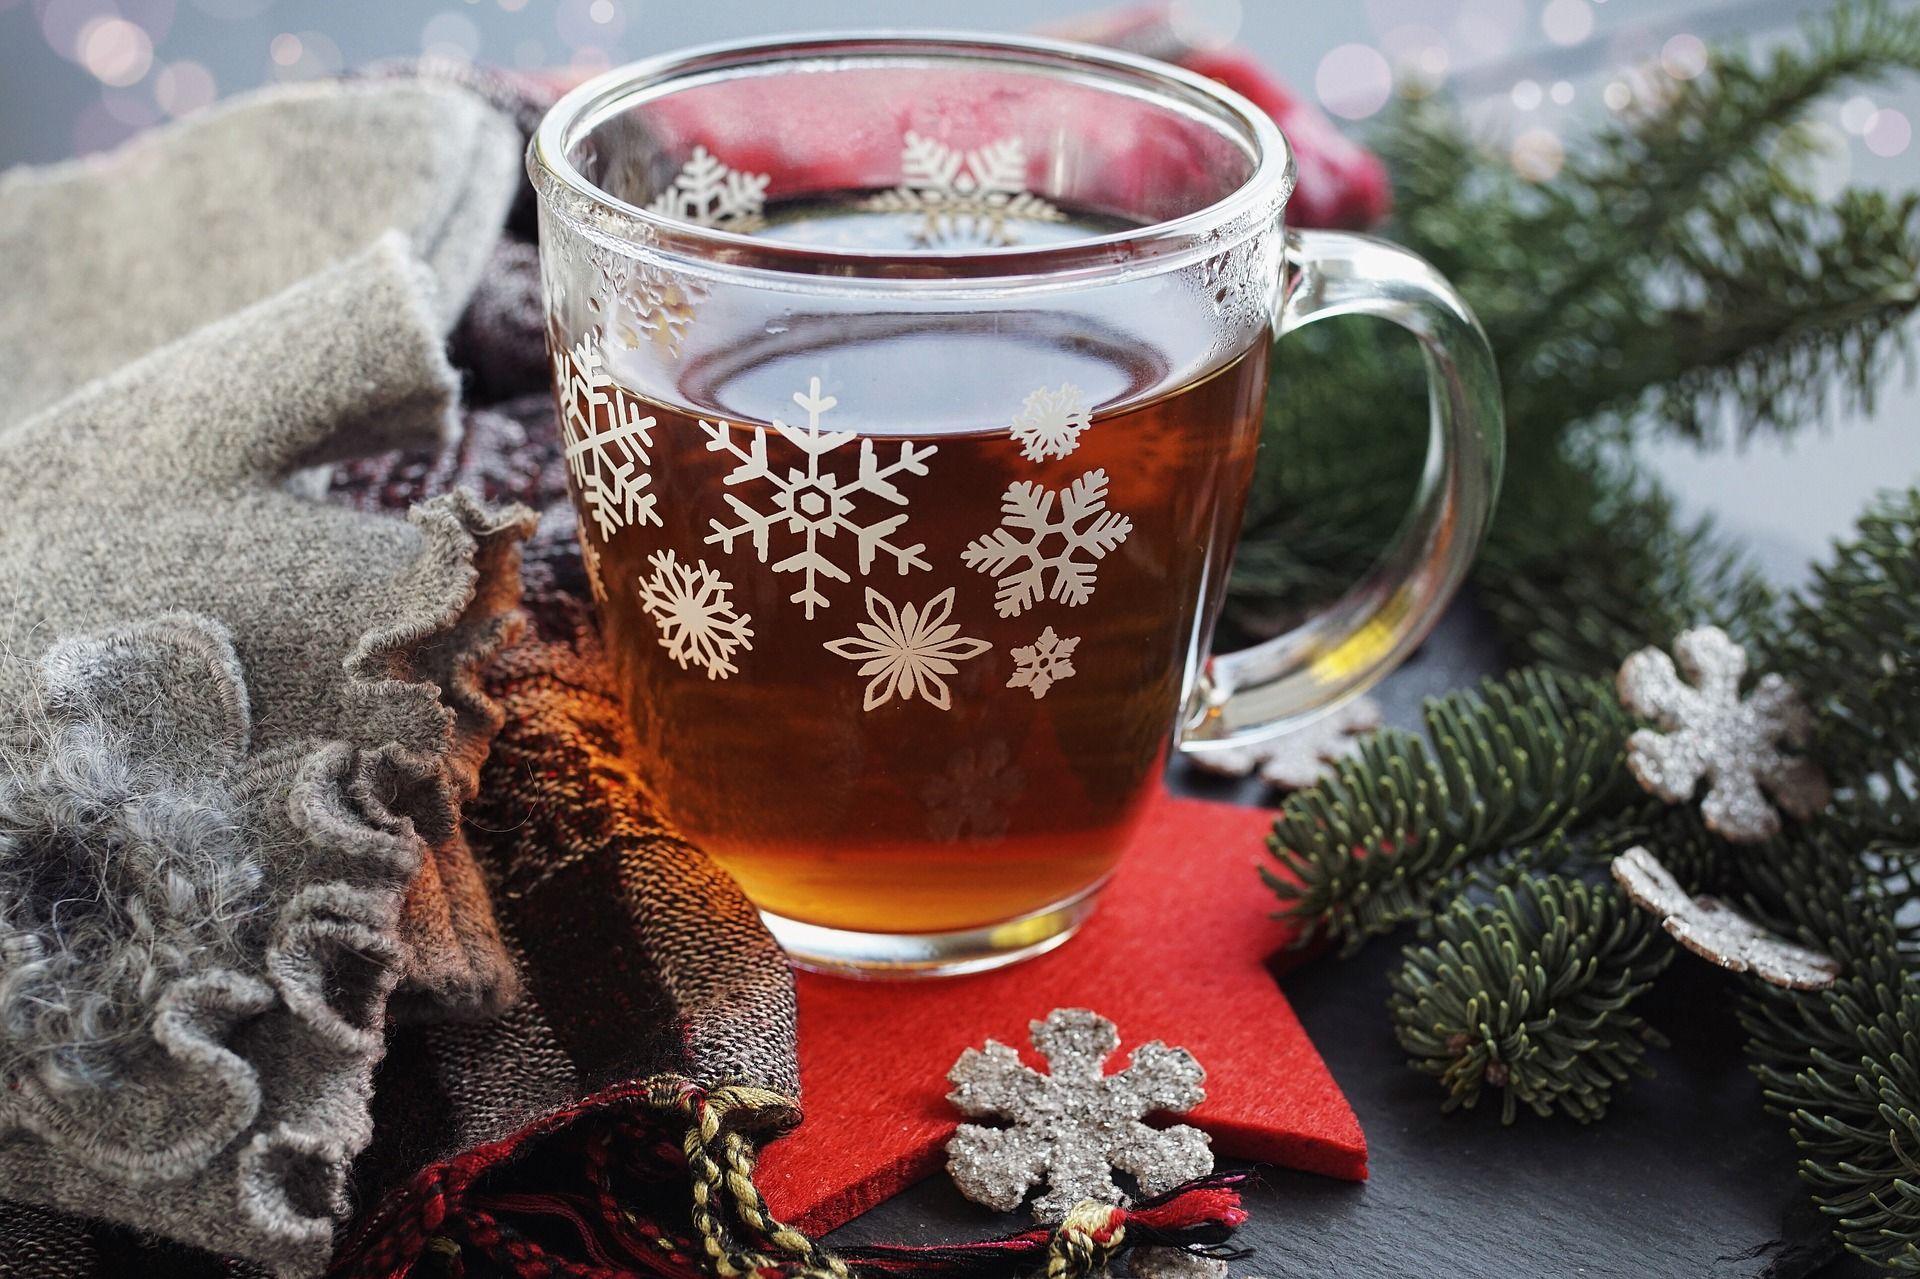 5 Traditional Christmas Drinks to Imbibe During This Festive Season